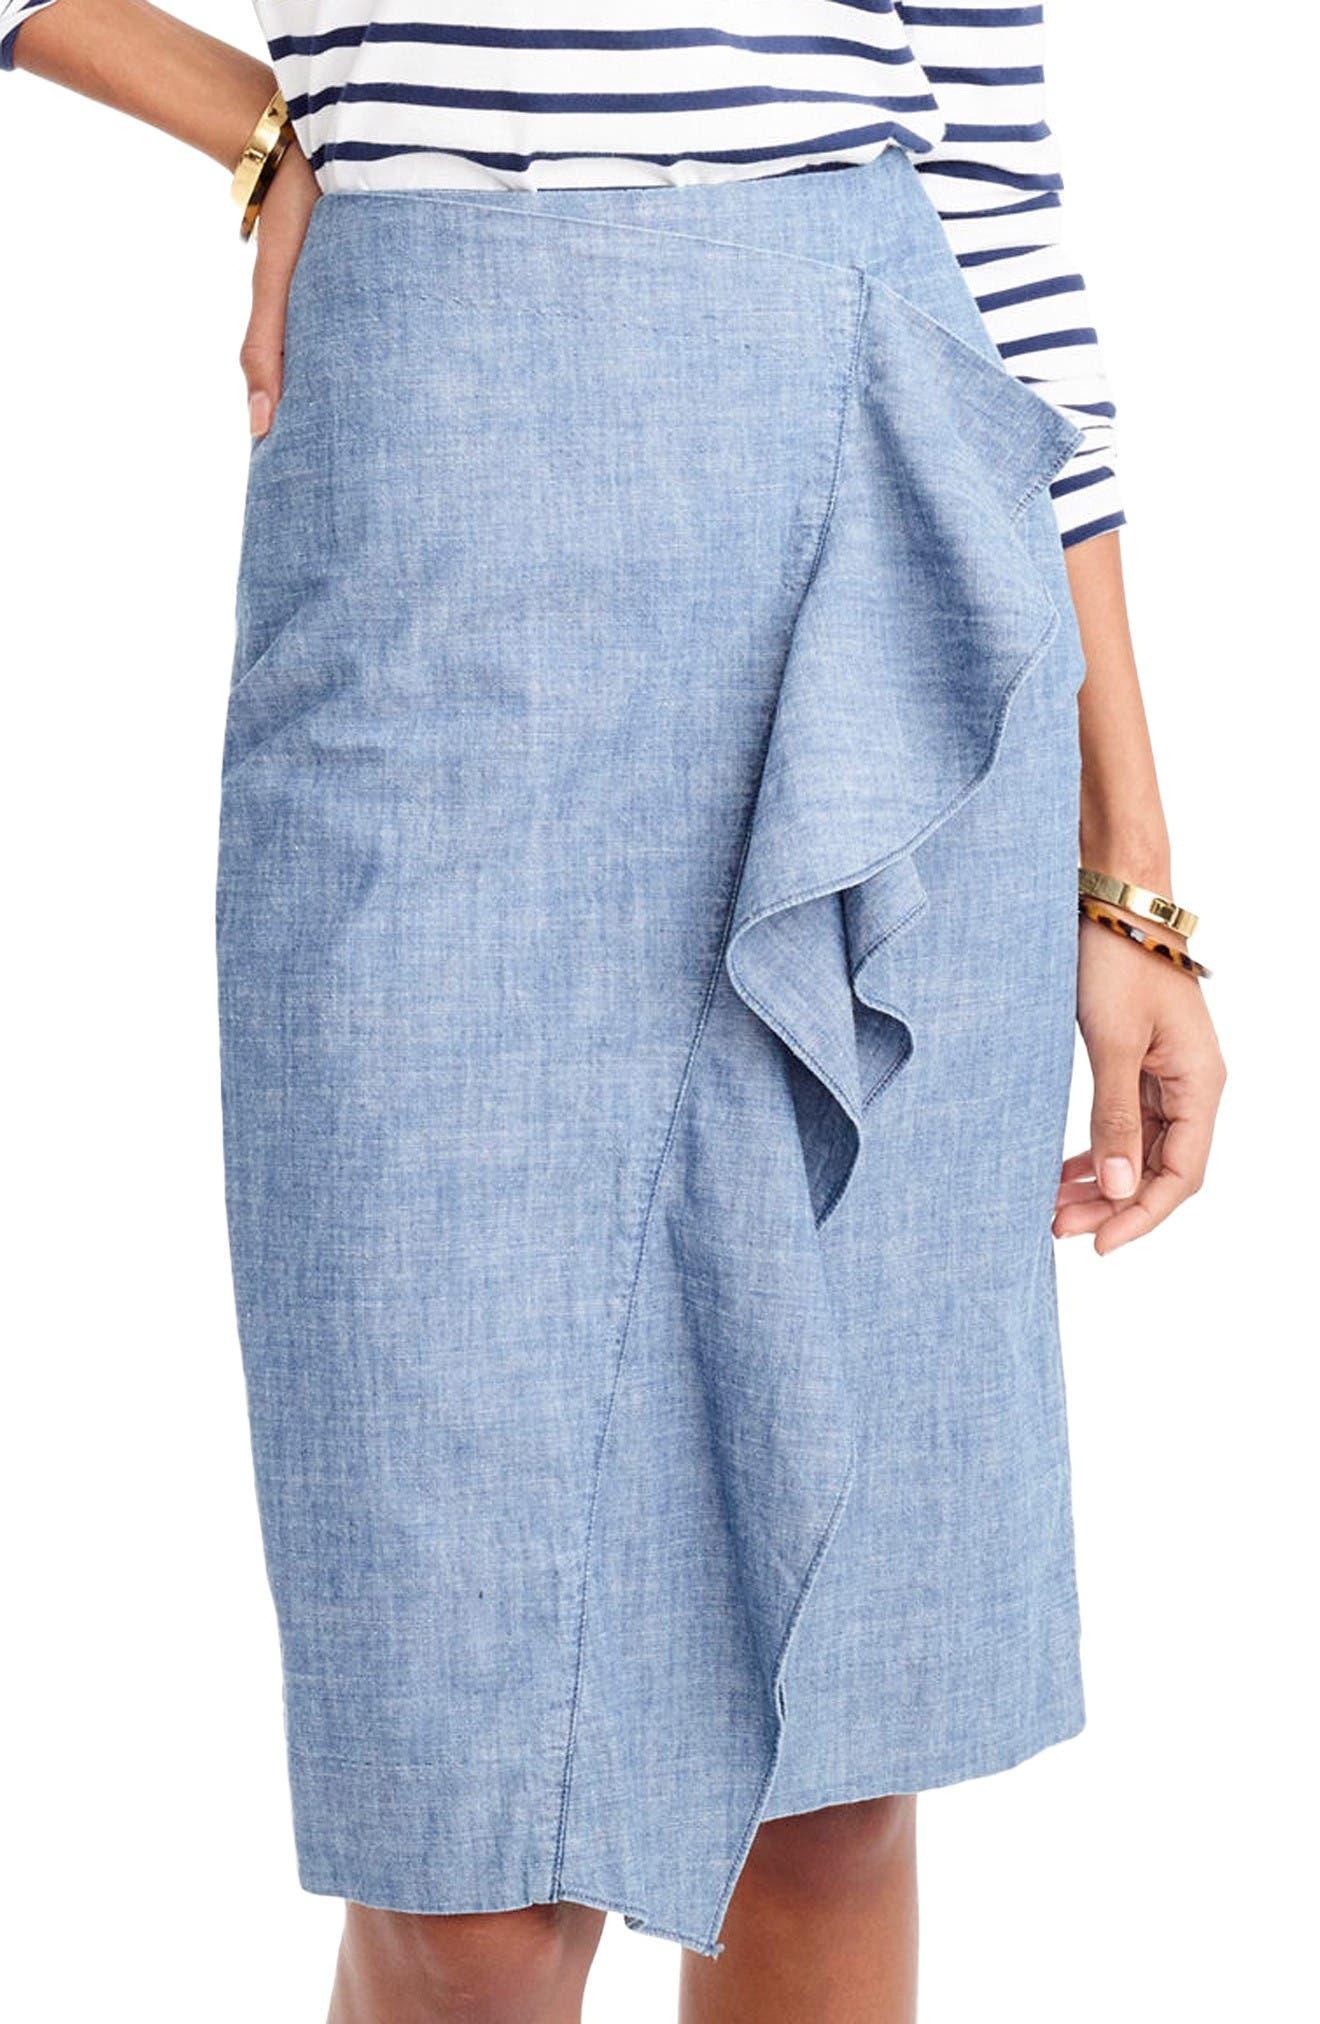 Chambray Ruffle Skirt,                             Alternate thumbnail 3, color,                             Pale Indigo